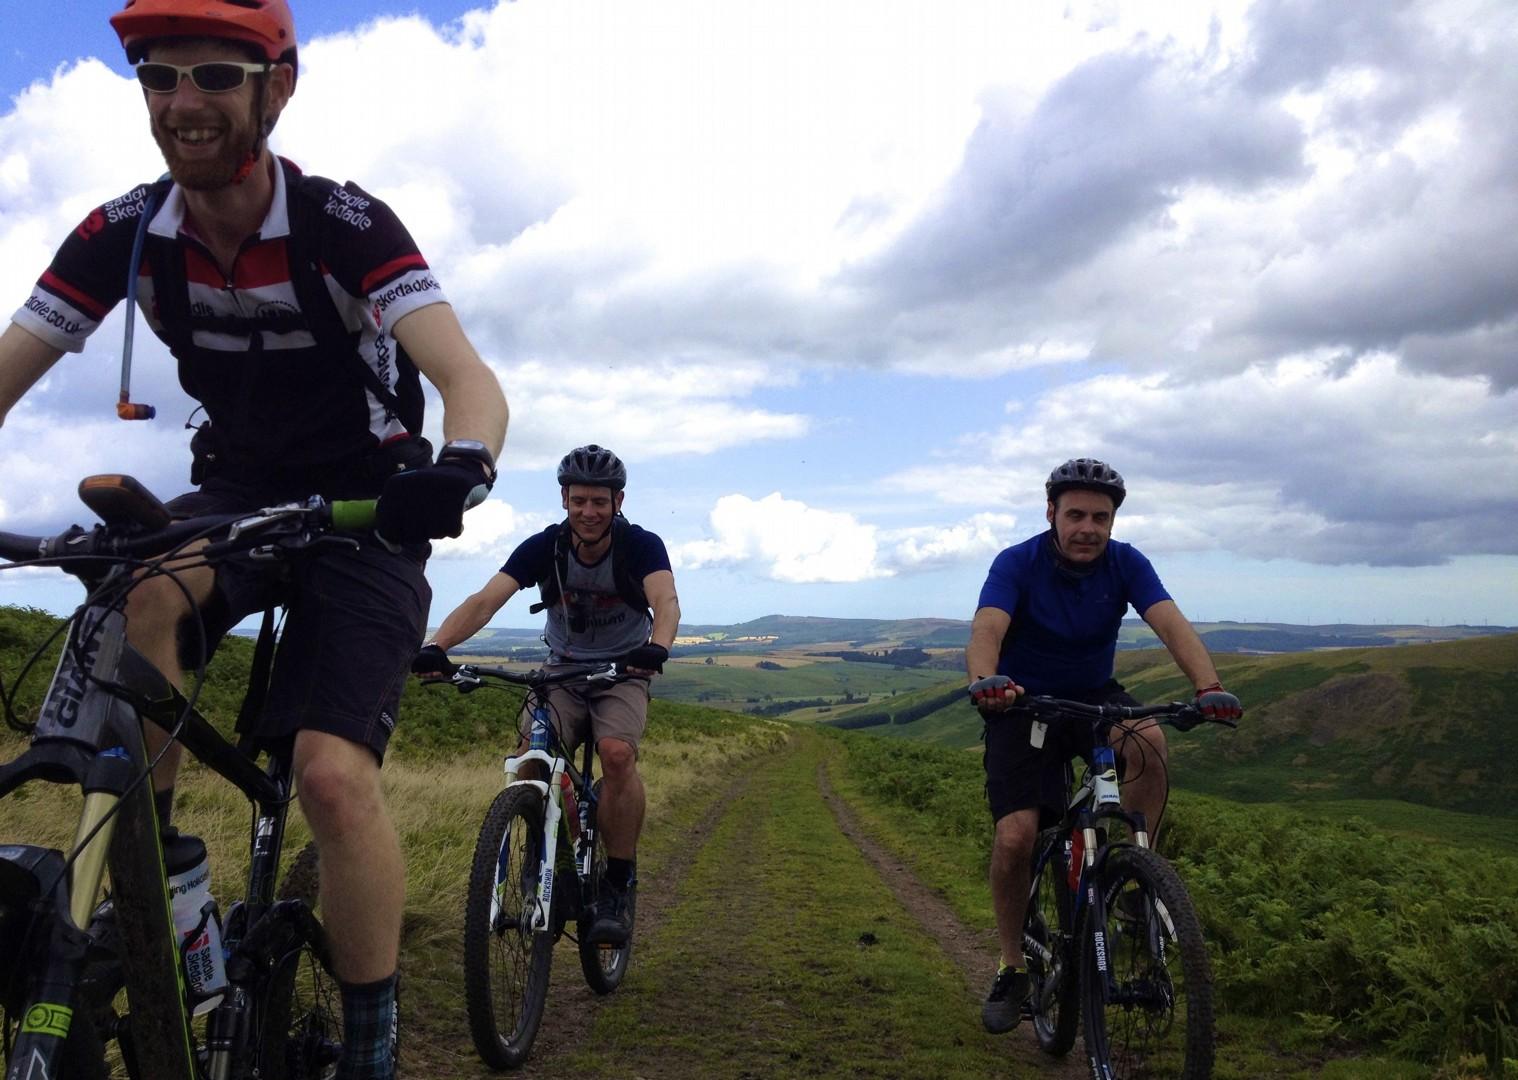 Sandstoneway.jpg - UK - Northumberland - Sandstone Way - Mountain Biking